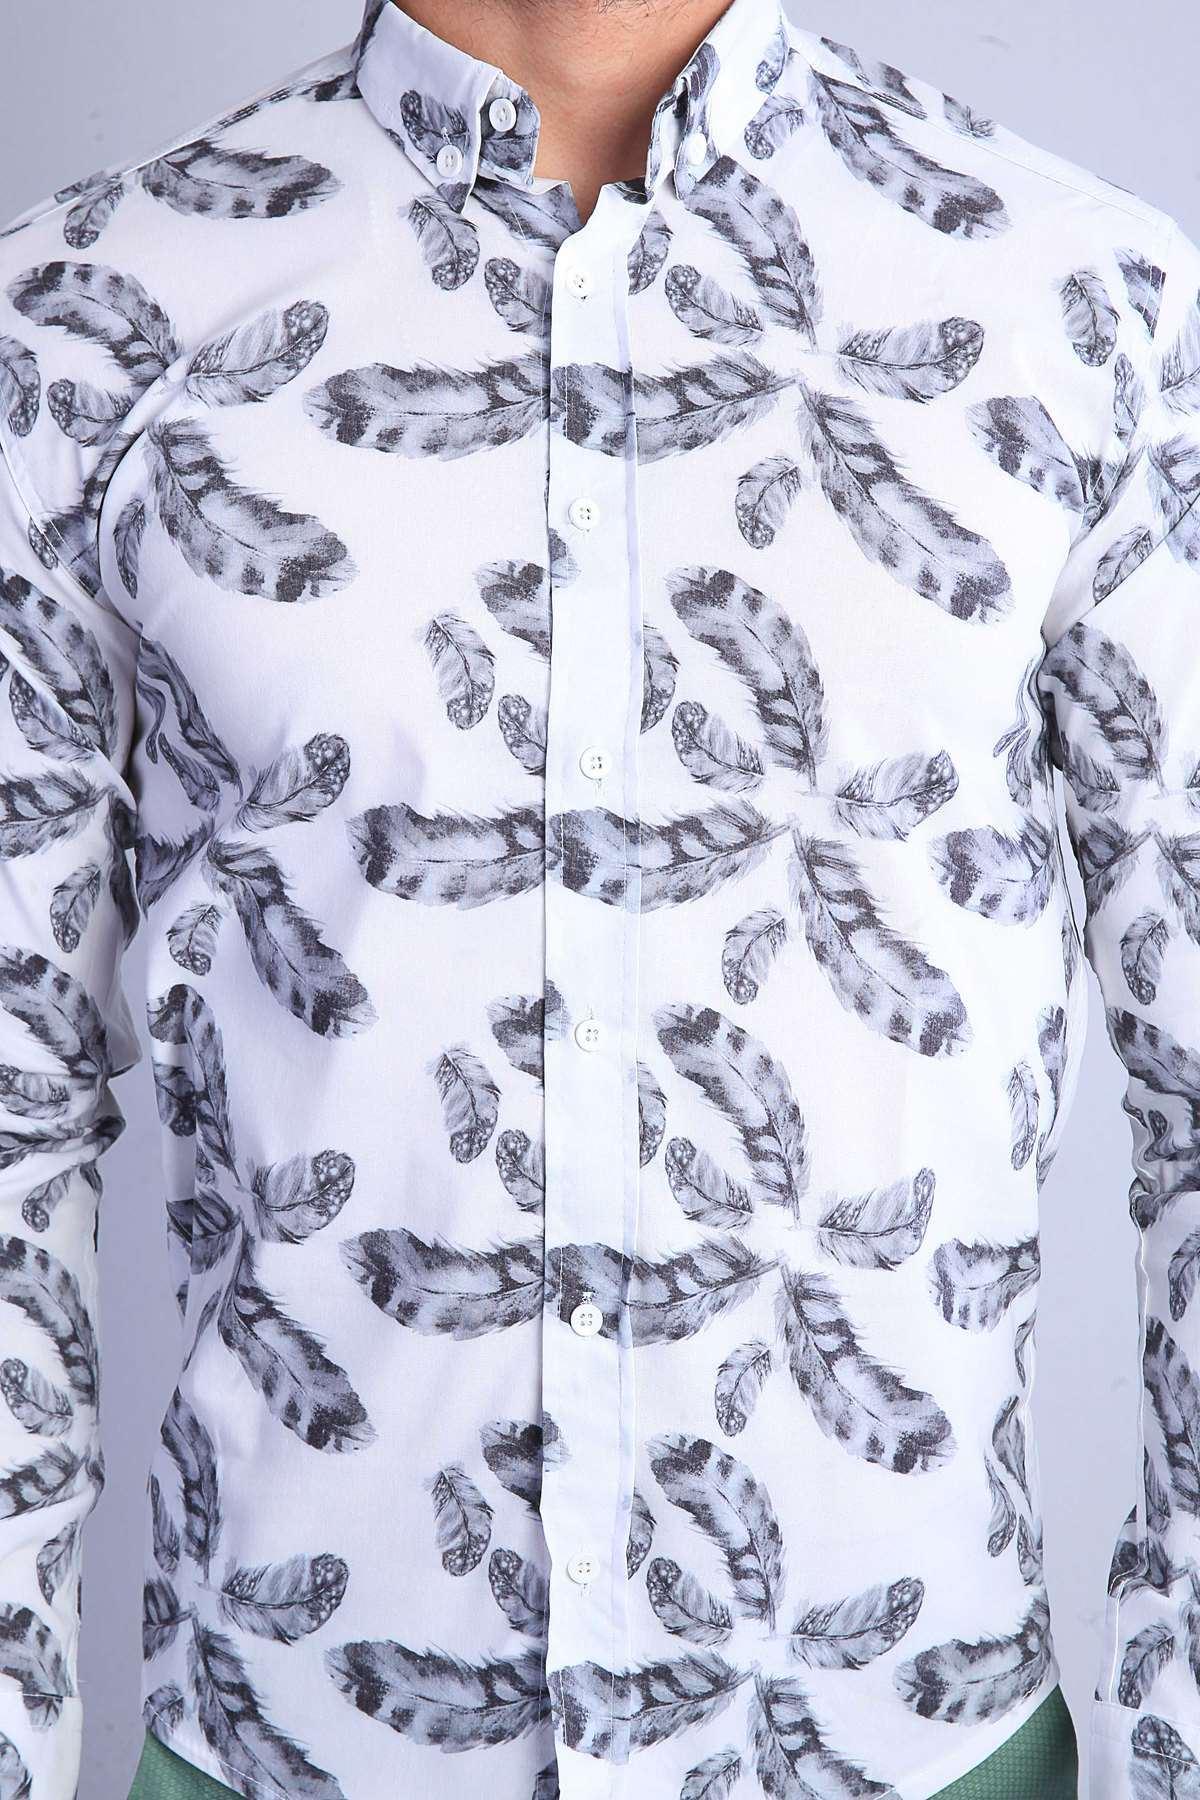 Yaprak Baskılı Slim Fit Gömlek Bey-Siyah